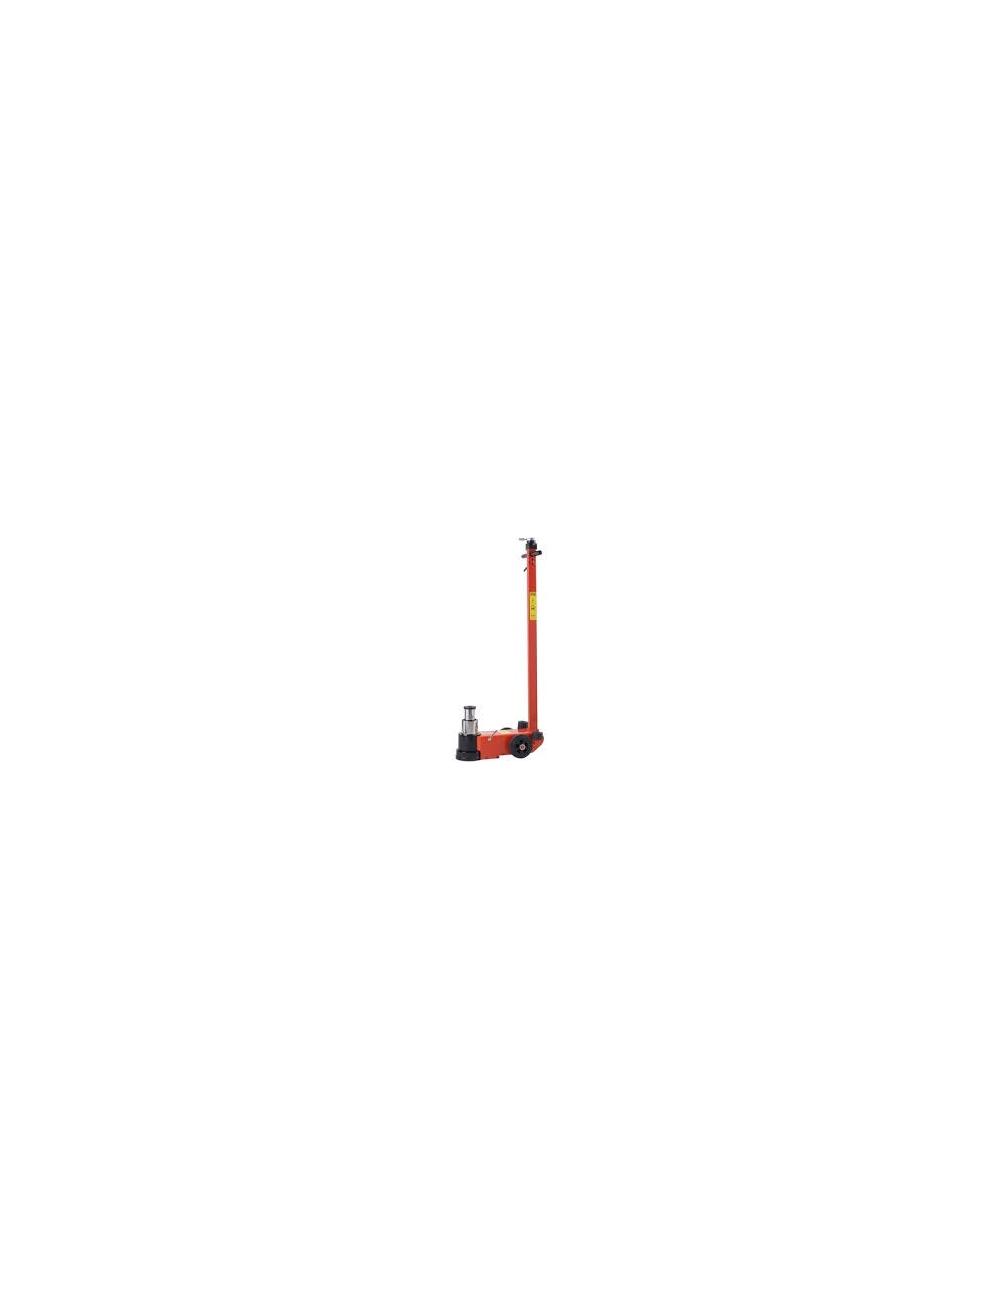 Cric hydropneumatique 40t20t long 0,8-1,2Mpa